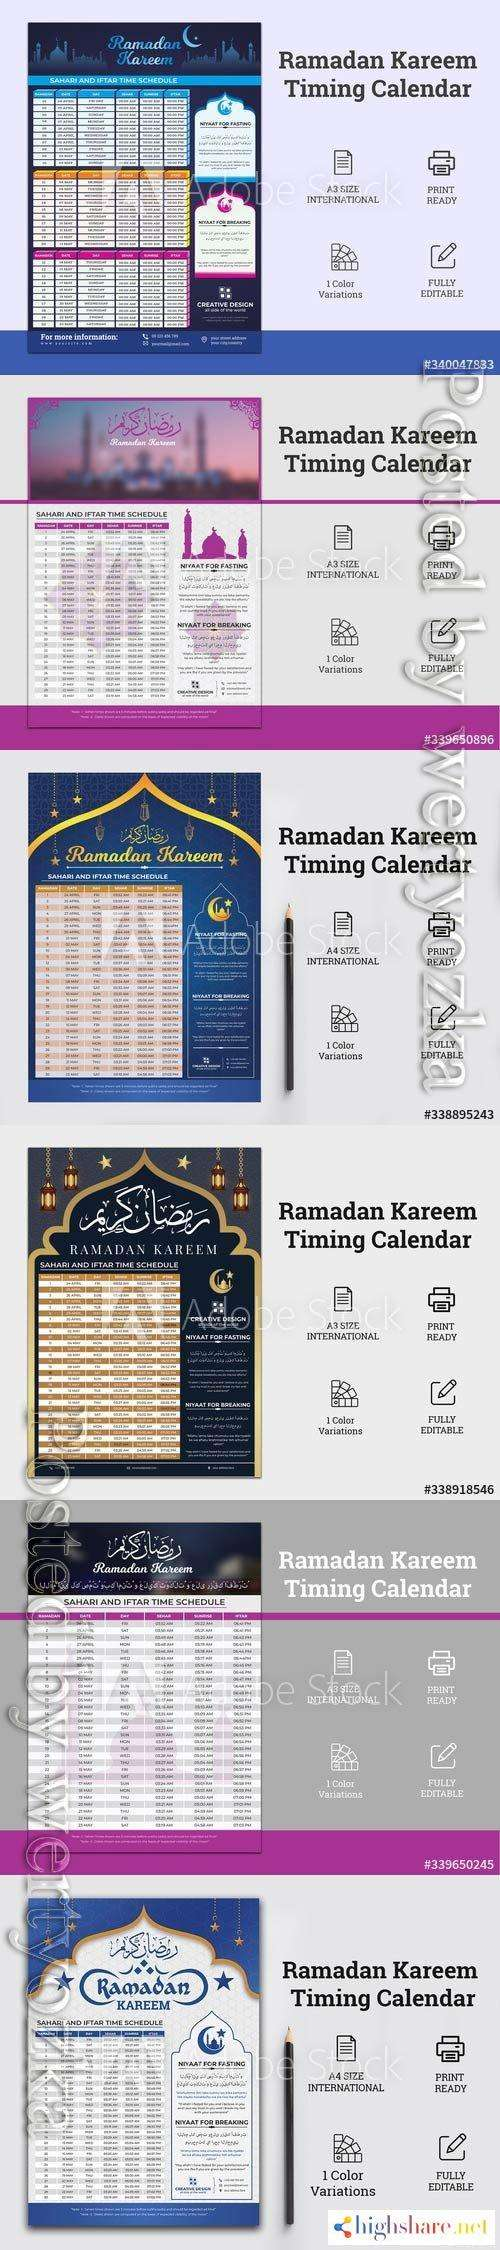 ramadan kareem calendar for fasting and prayer time guide 5f43832da4b5d - Ramadan Kareem calendar for fasting and prayer time guide